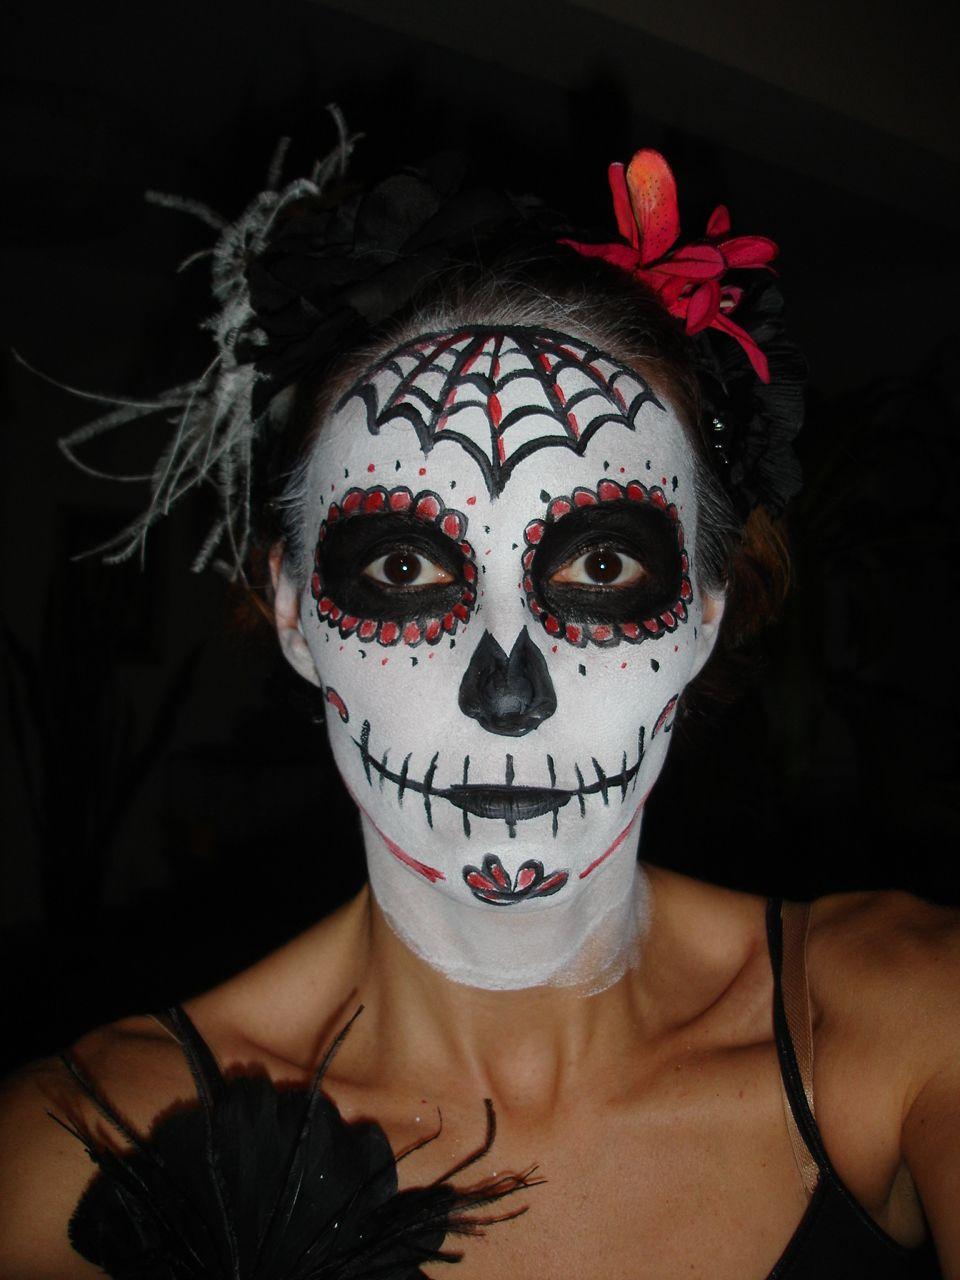 maquillage squelette mexicain petite fille. Black Bedroom Furniture Sets. Home Design Ideas